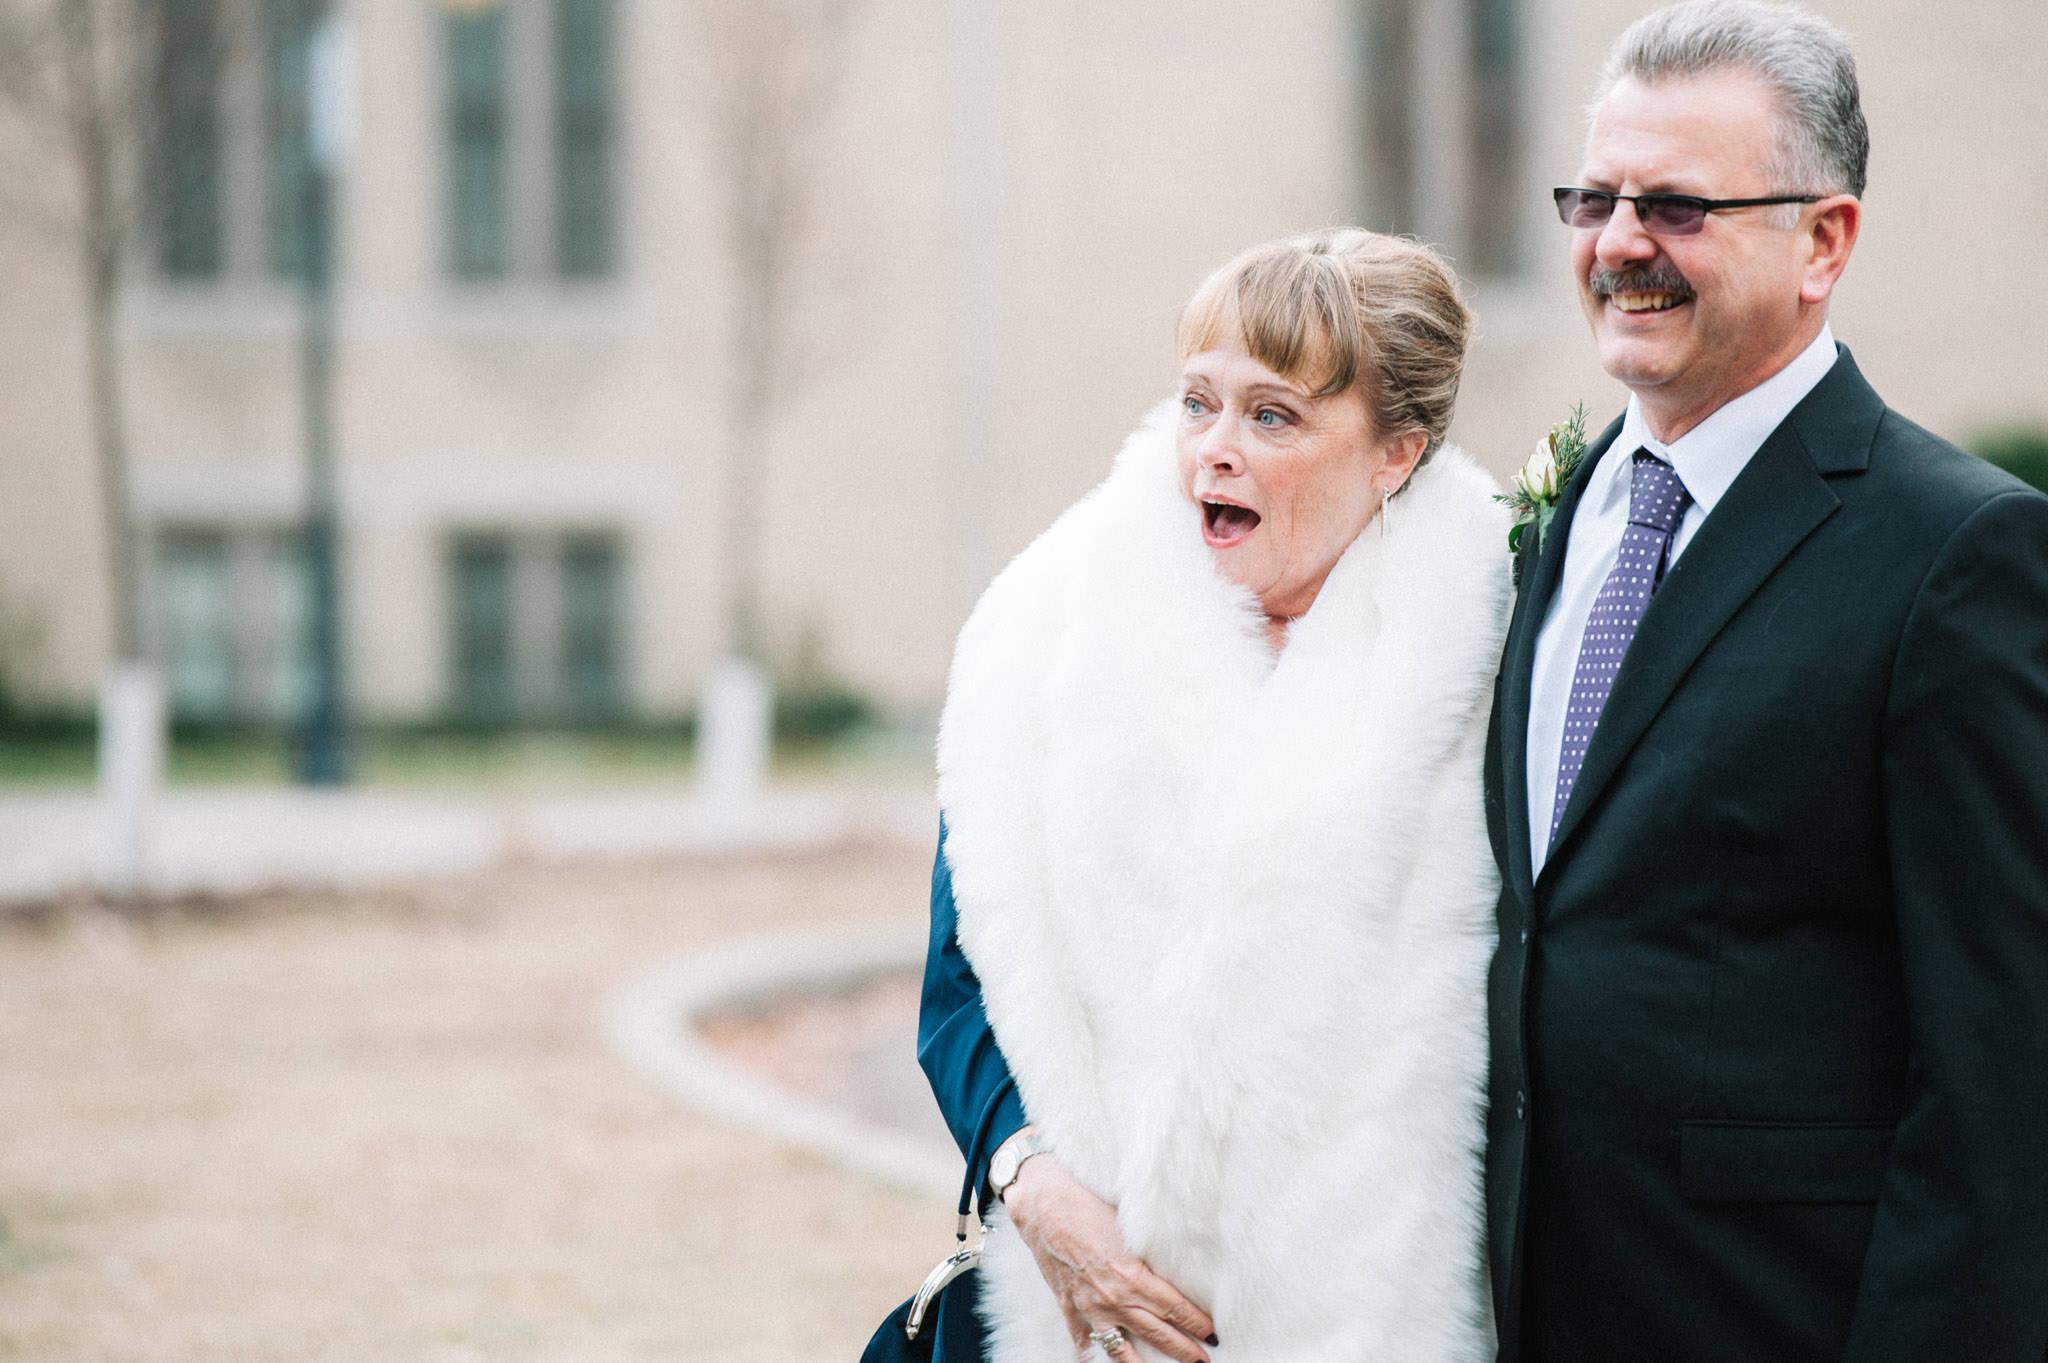 Documentary Toronto wedding photographer